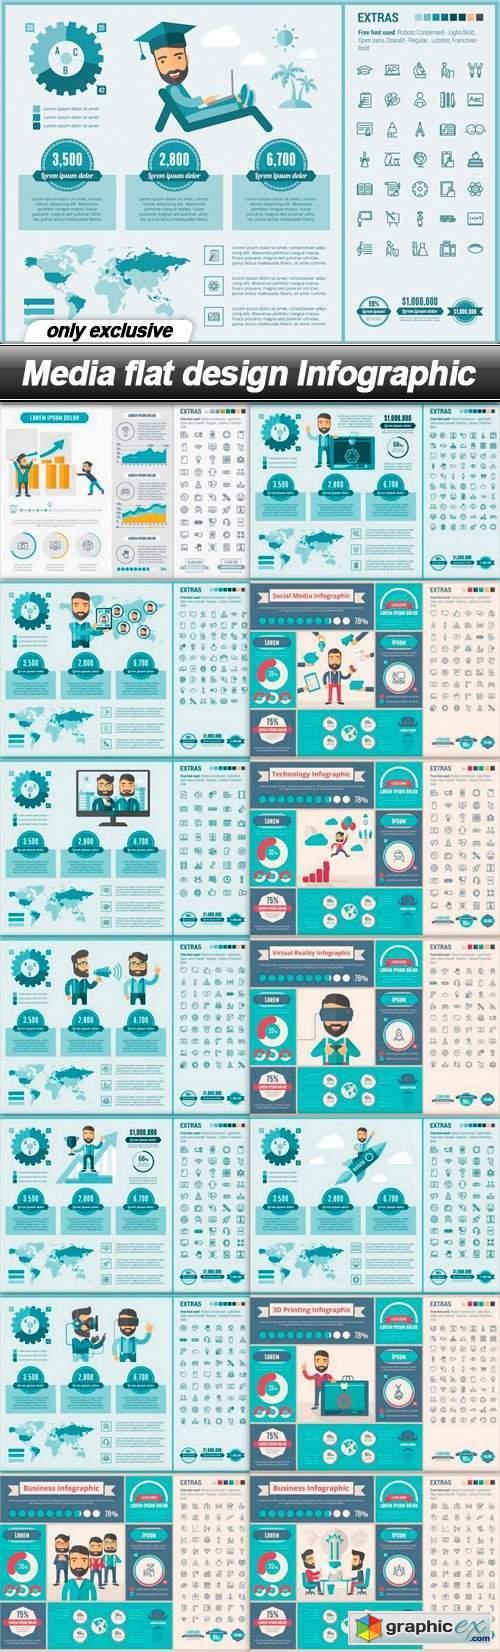 Media flat design Infographic - 15 EPS